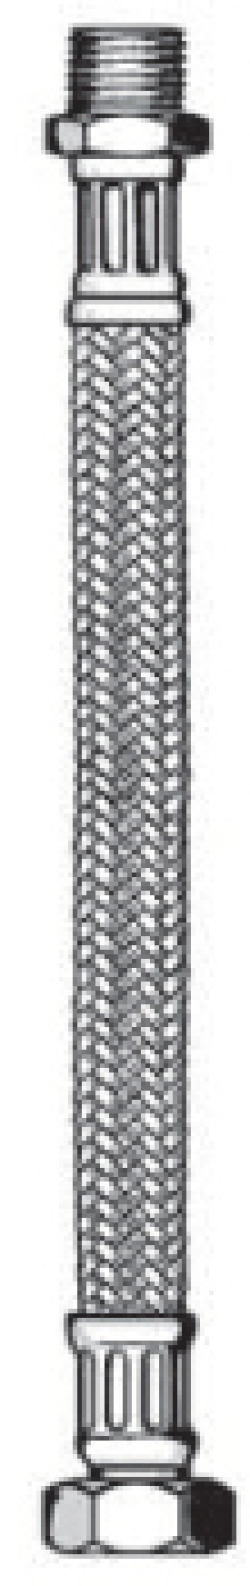 МЕ 5615.1204.60 Meiflex Dn13, 1/2 BPx1/2 BP, 600mm